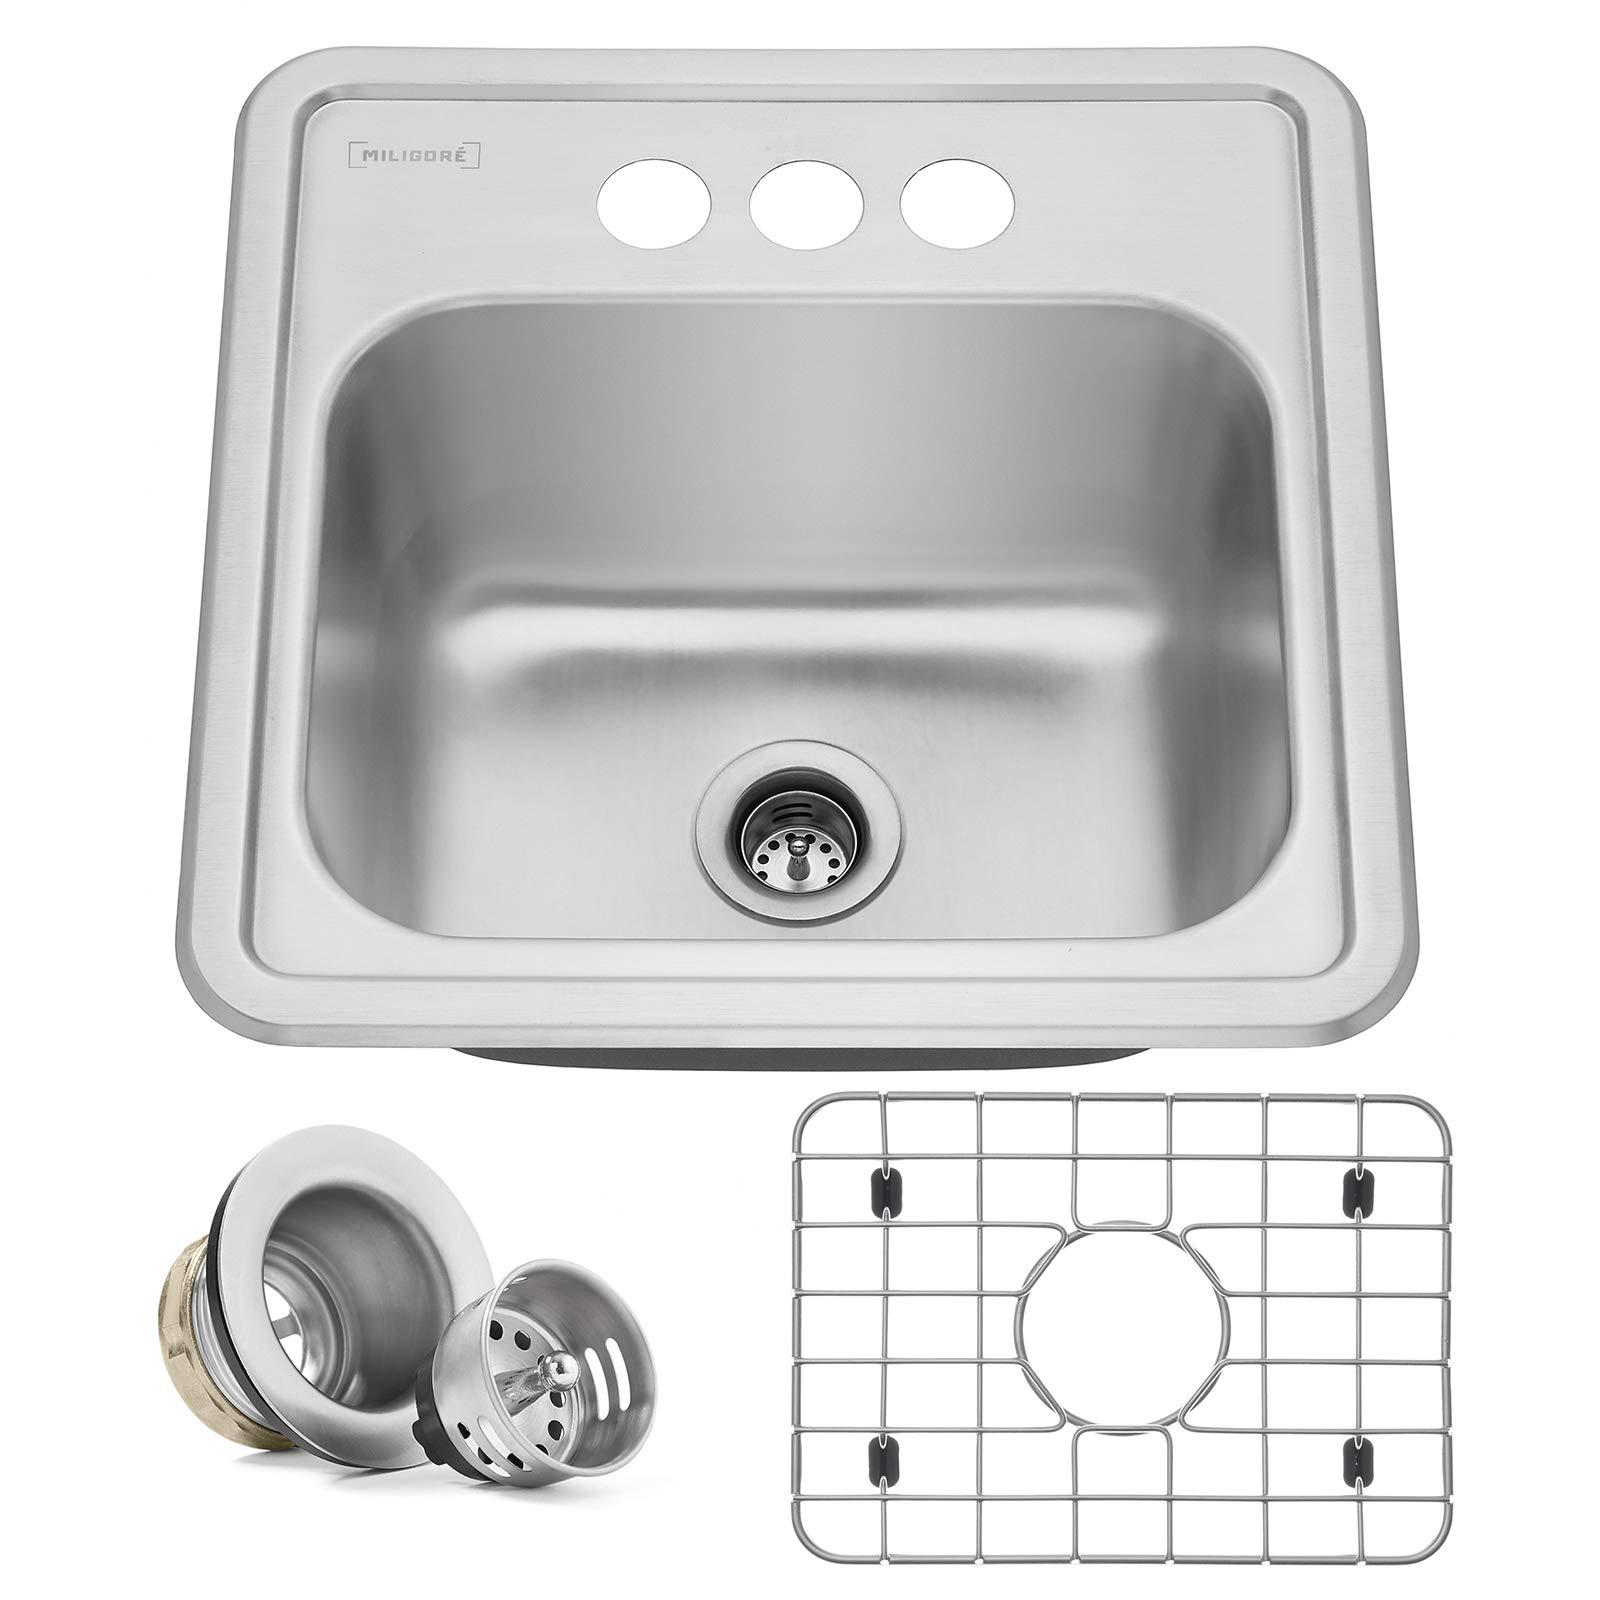 Miligore 15'' x 15'' x 6'' Deep Single Bowl Top-Mount Drop-in 22-Gauge Stainless Steel Bar/Prep/Utility Sink - Includes Drain/Grid by Miligore